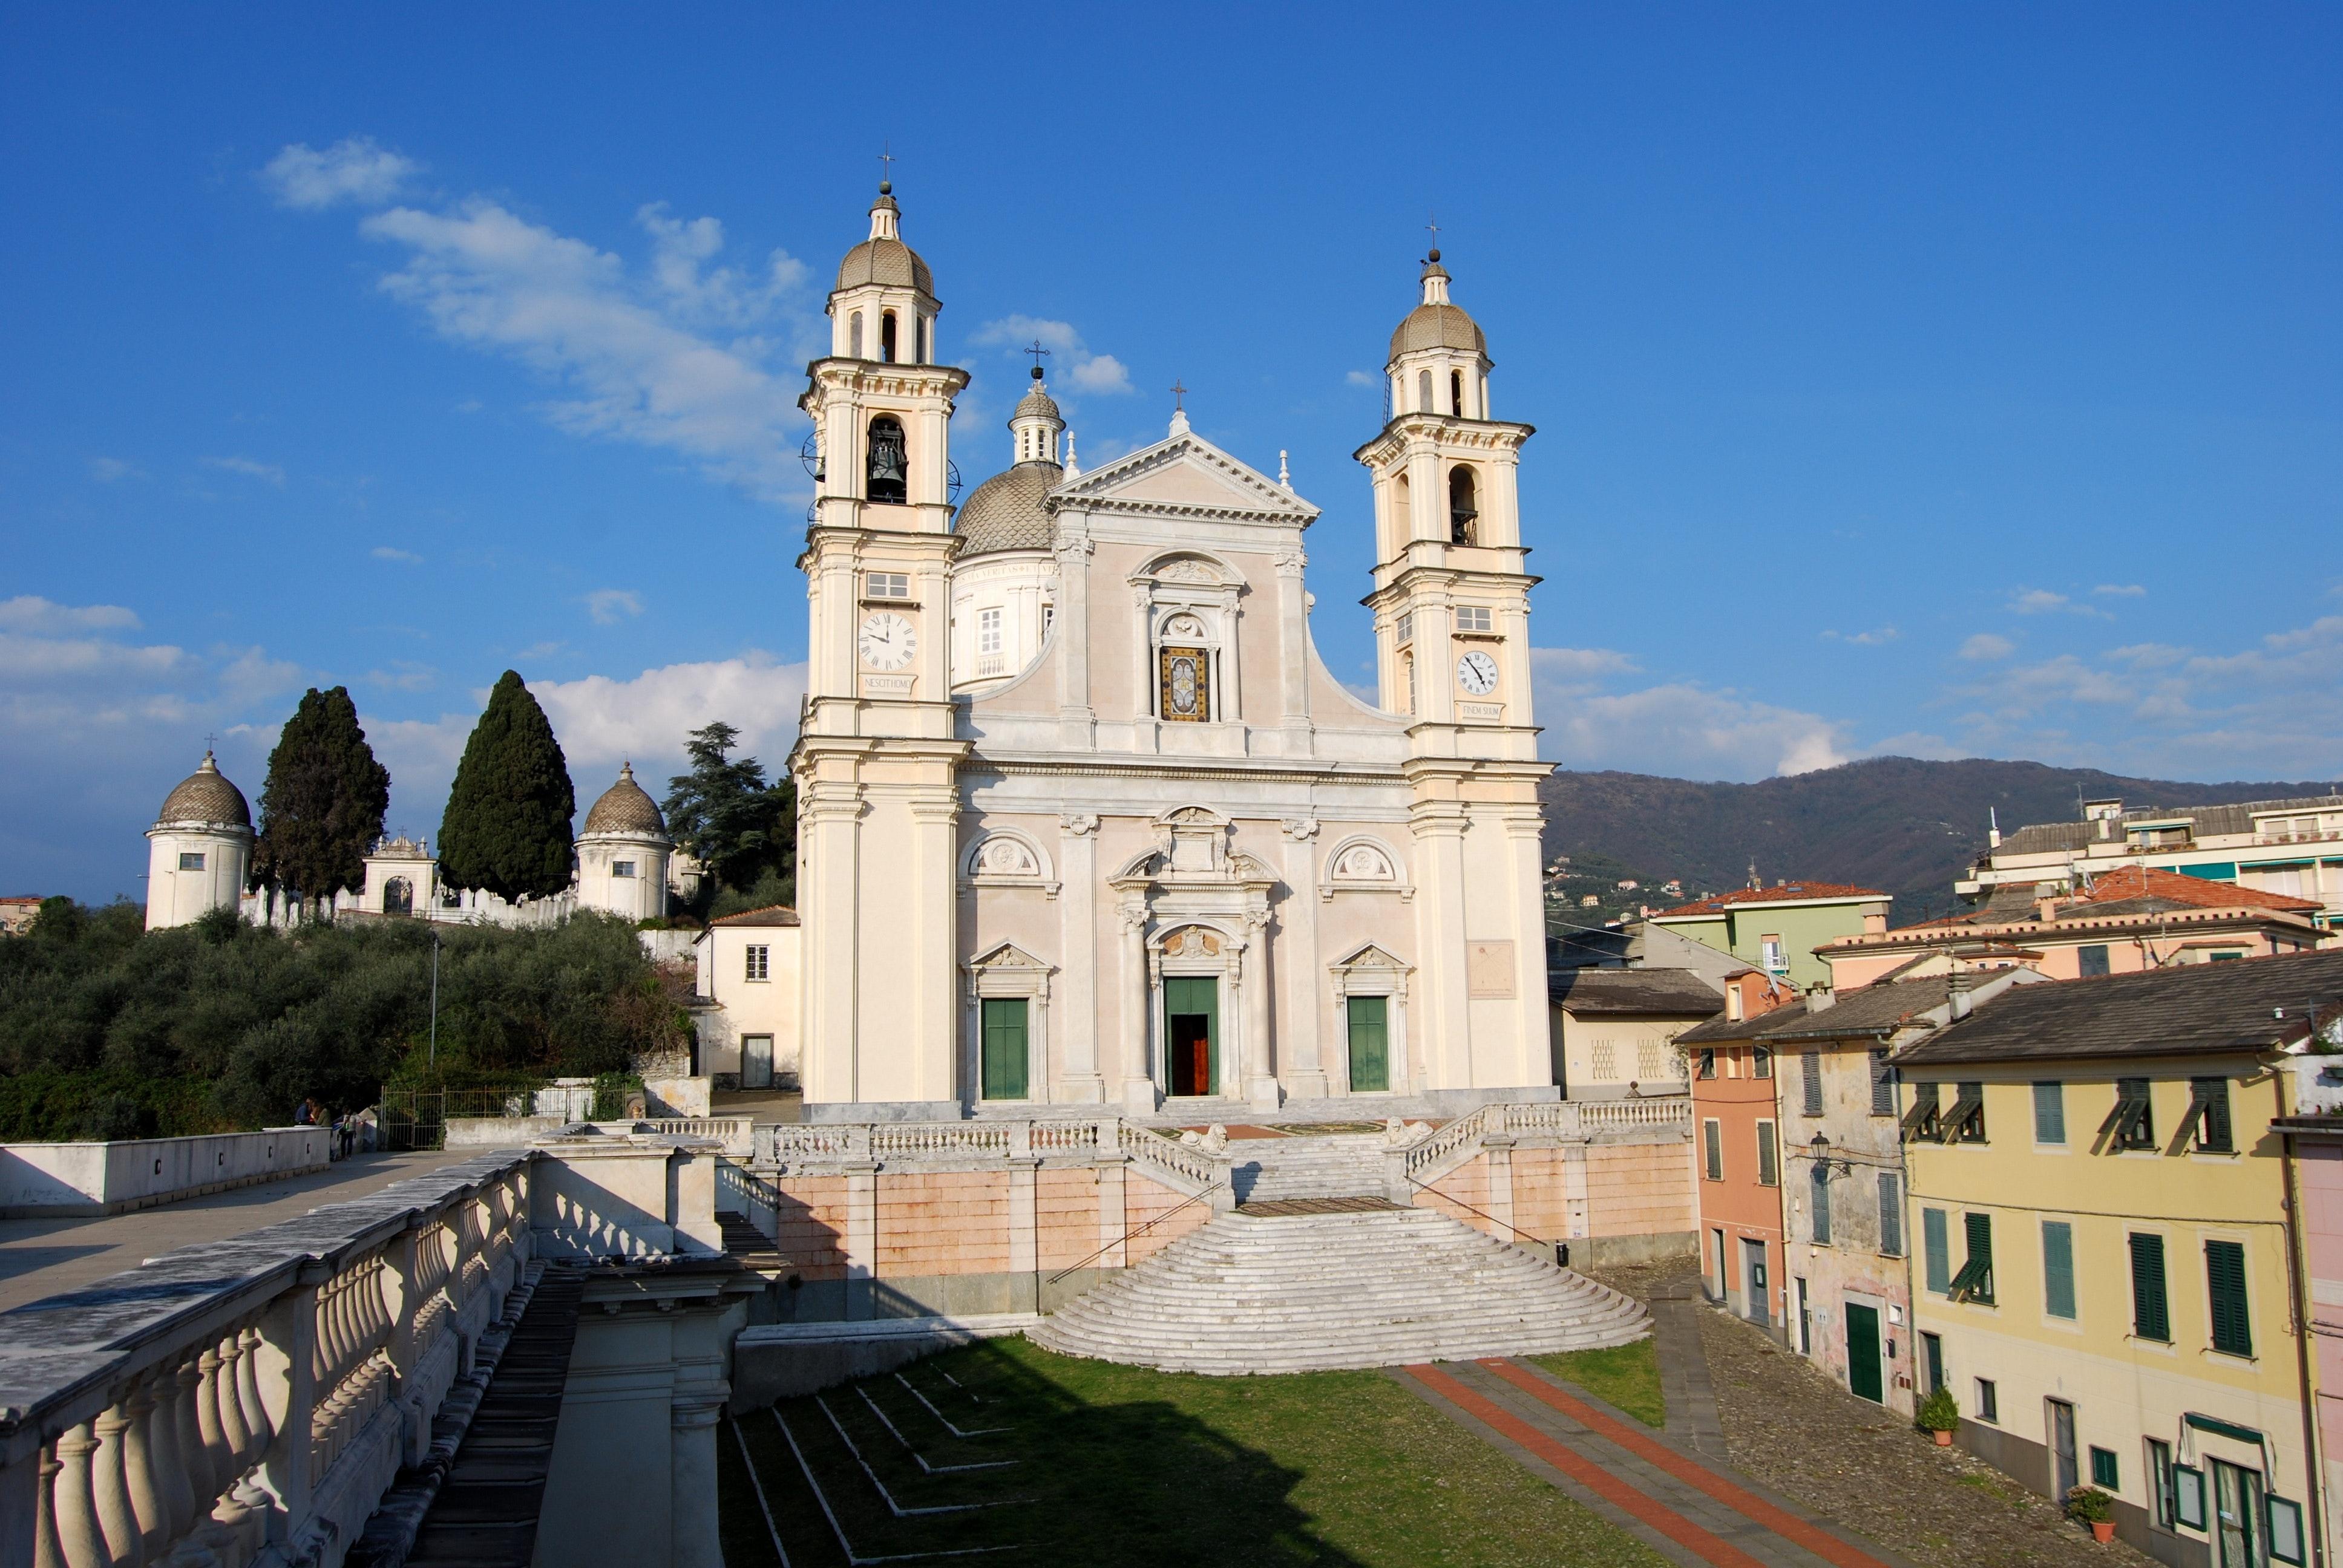 La chiesa principale, CASA CARBONE, LAVAGNA (GE )